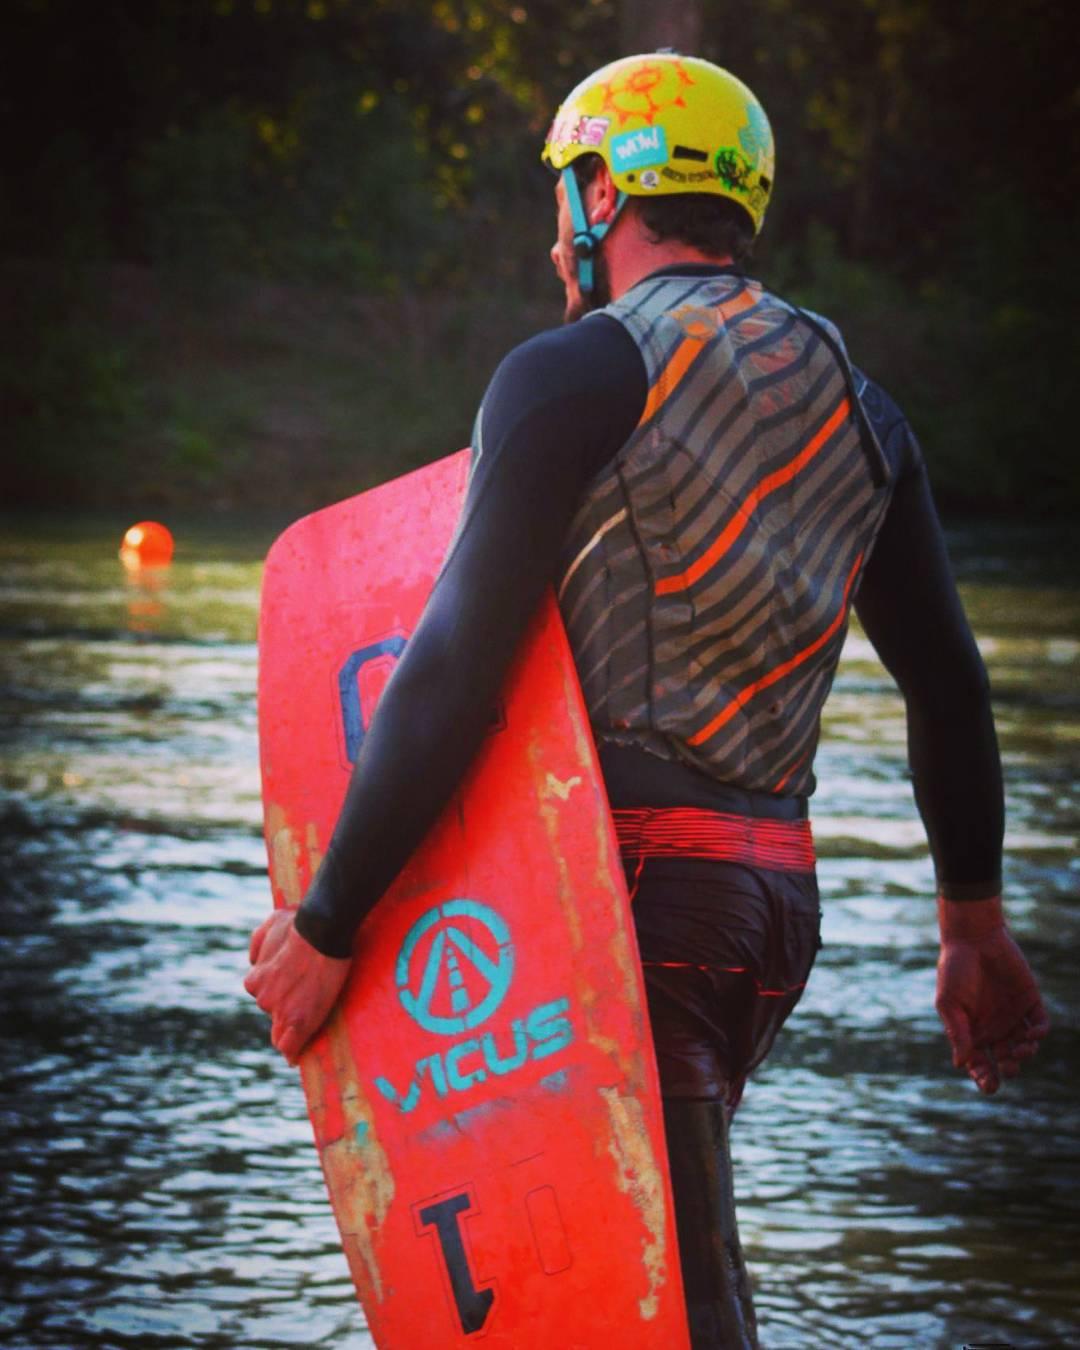 Al agua!  #wakeskate #wakeboard #wakeboarding #wakelife